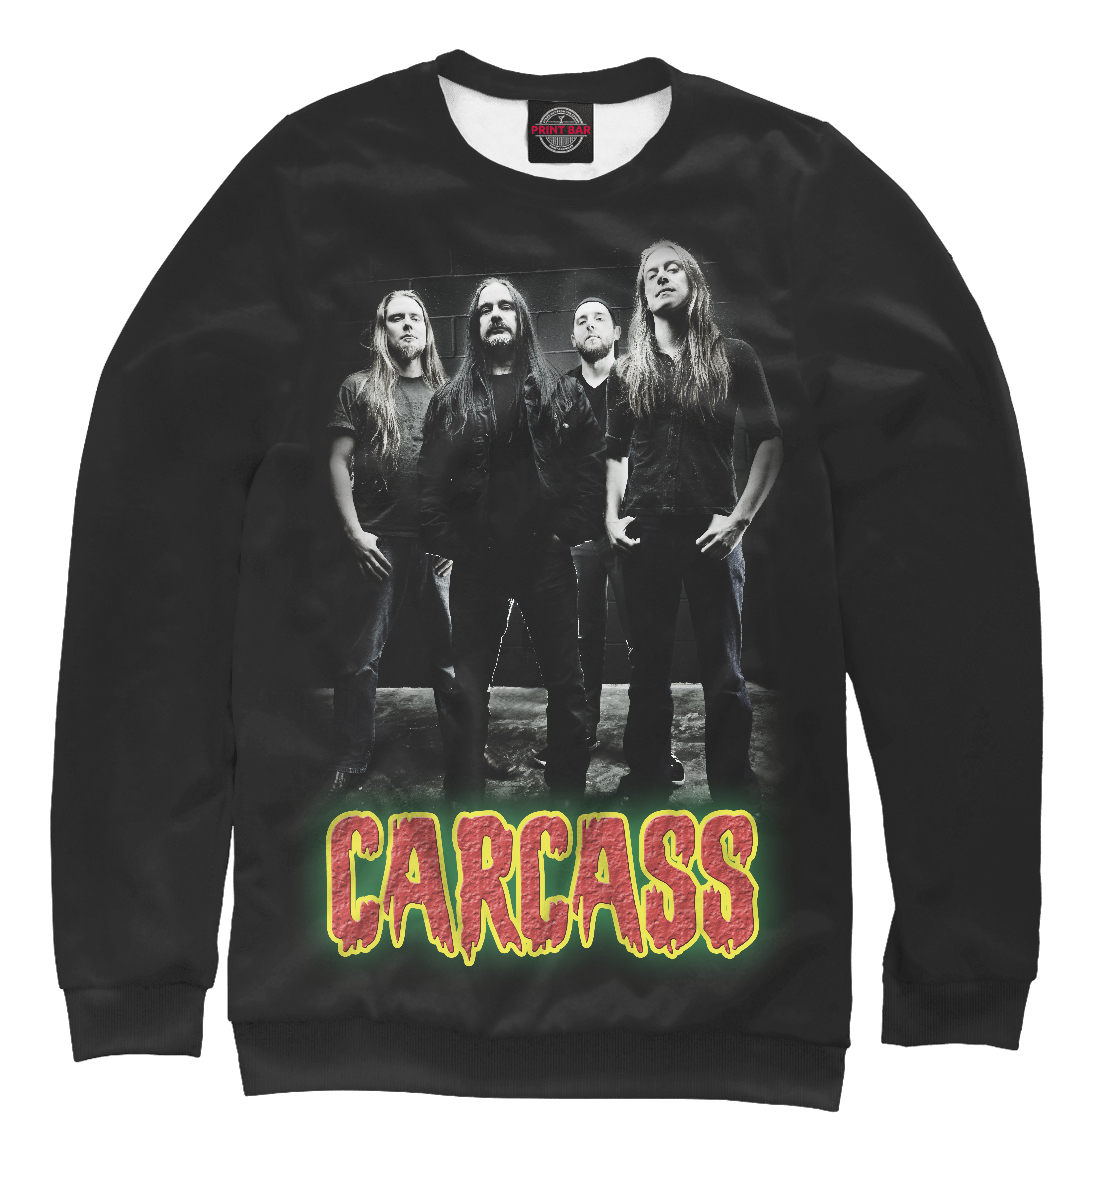 Carcass Death metal band